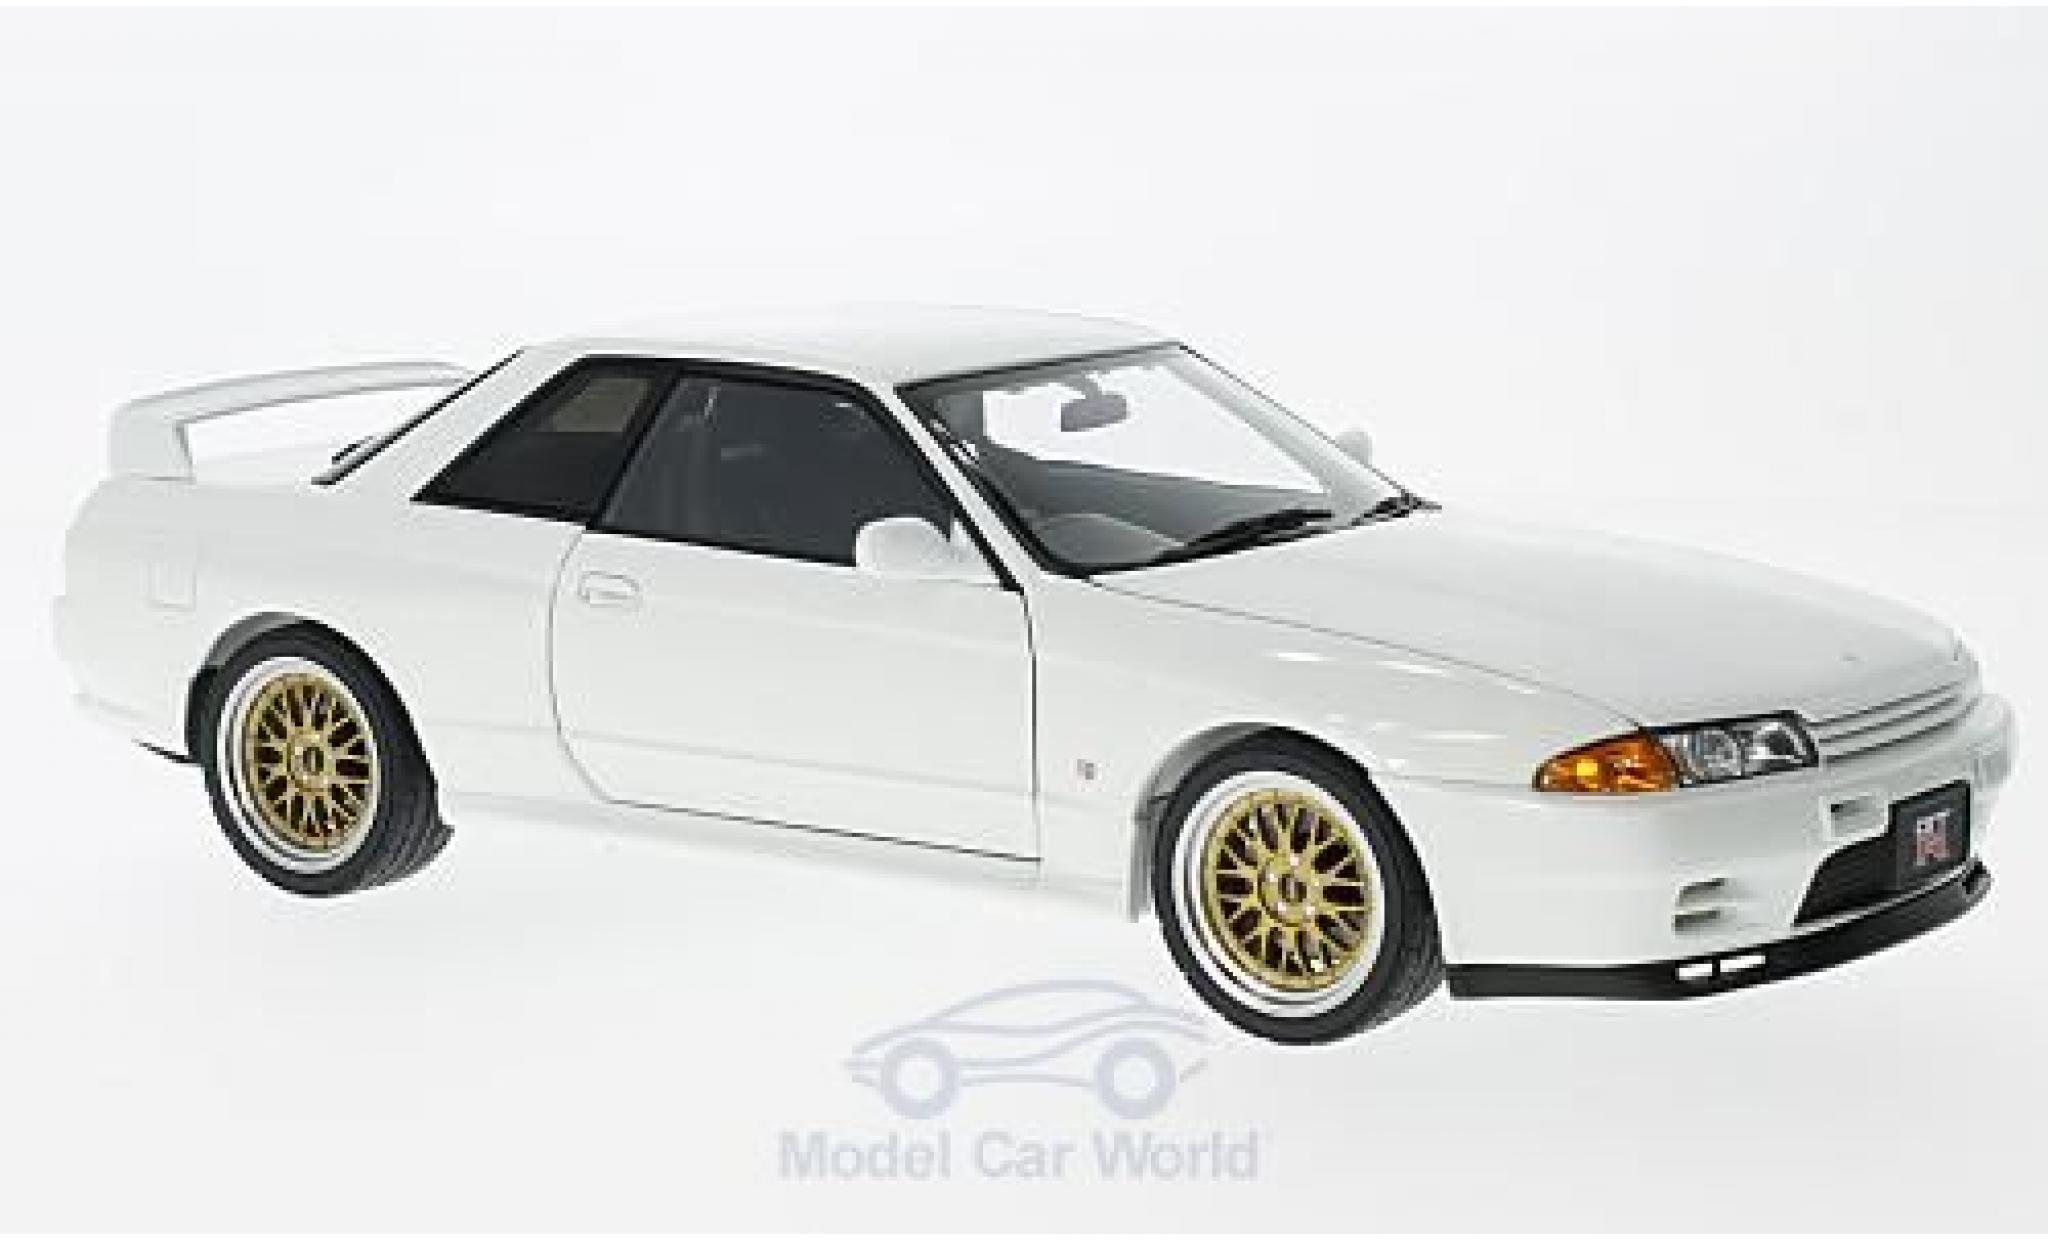 Nissan Skyline 1/18 AUTOart GT-R (R32) V-Spec II blanche RHD 1991 Tuned Version